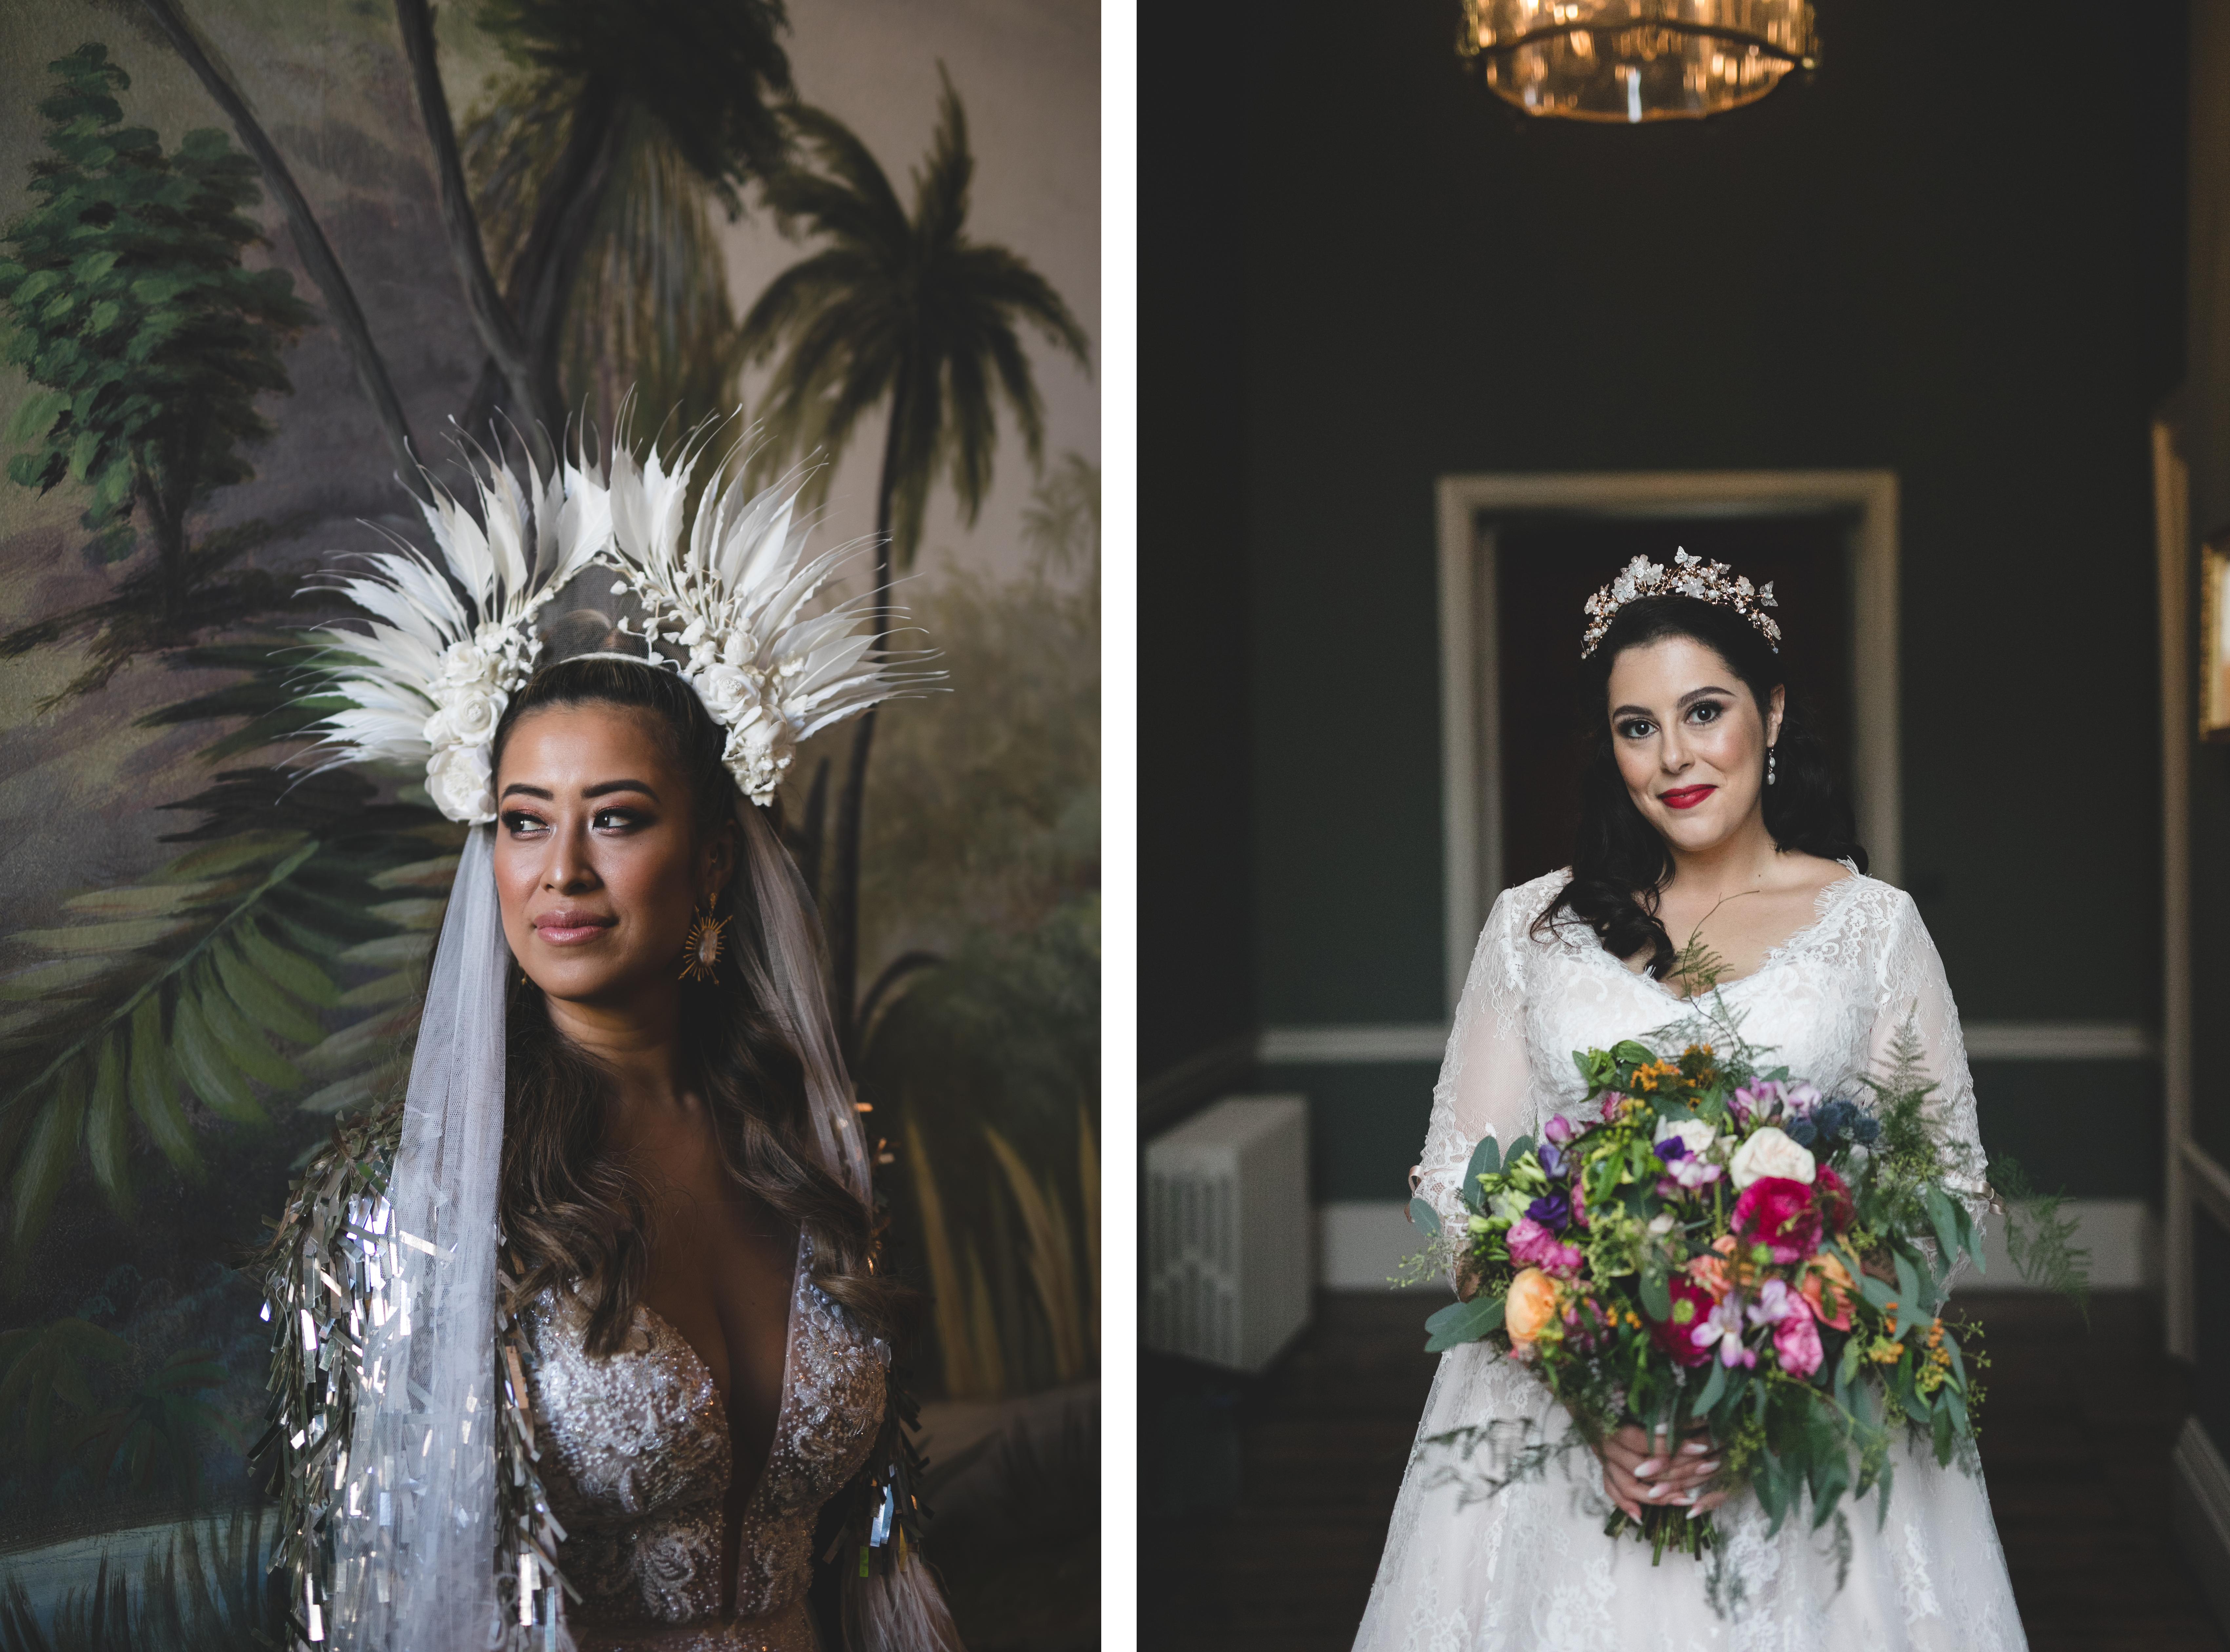 Headshot portraits of brides during the wedding morning